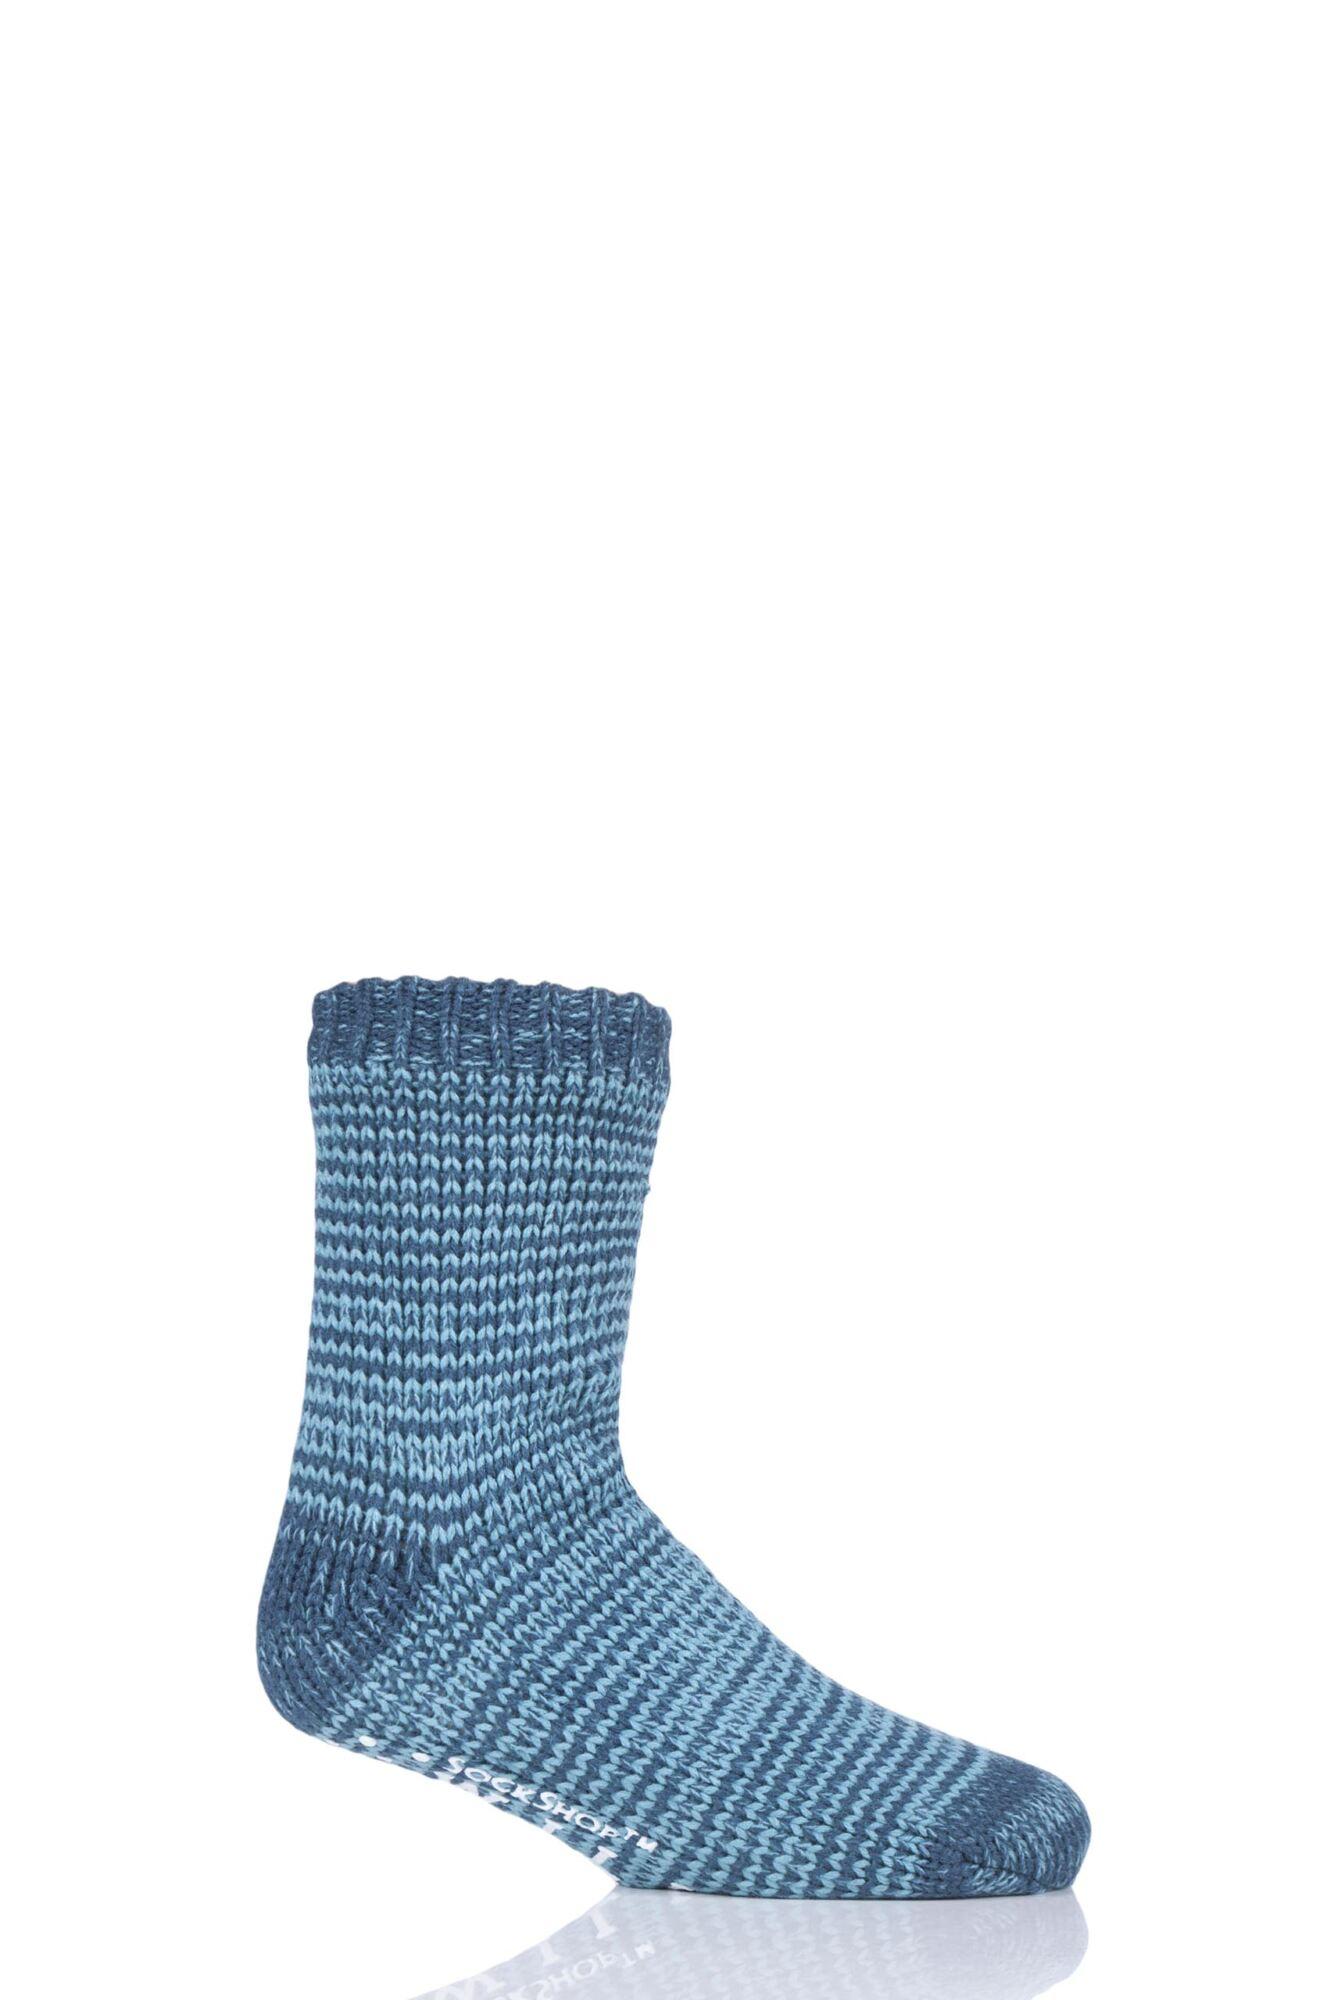 1 Pair Chunky Fleece Lined Lounge Socks Men's - Wild Feet